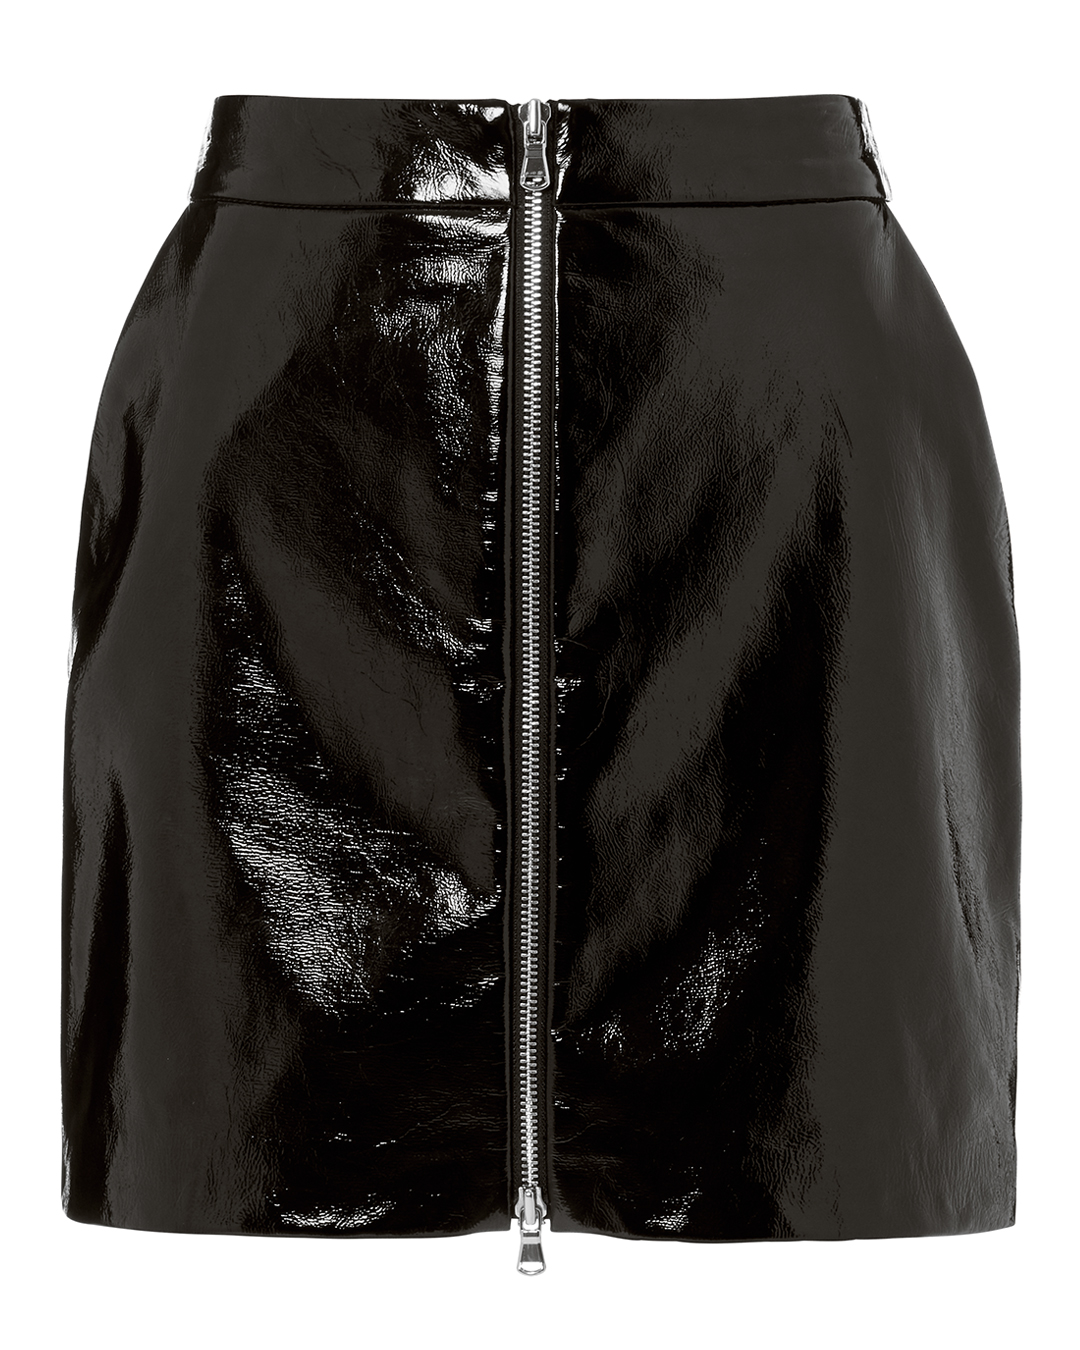 Claudia Patent Leather Zip-Front Miniskirt - Black Size 2